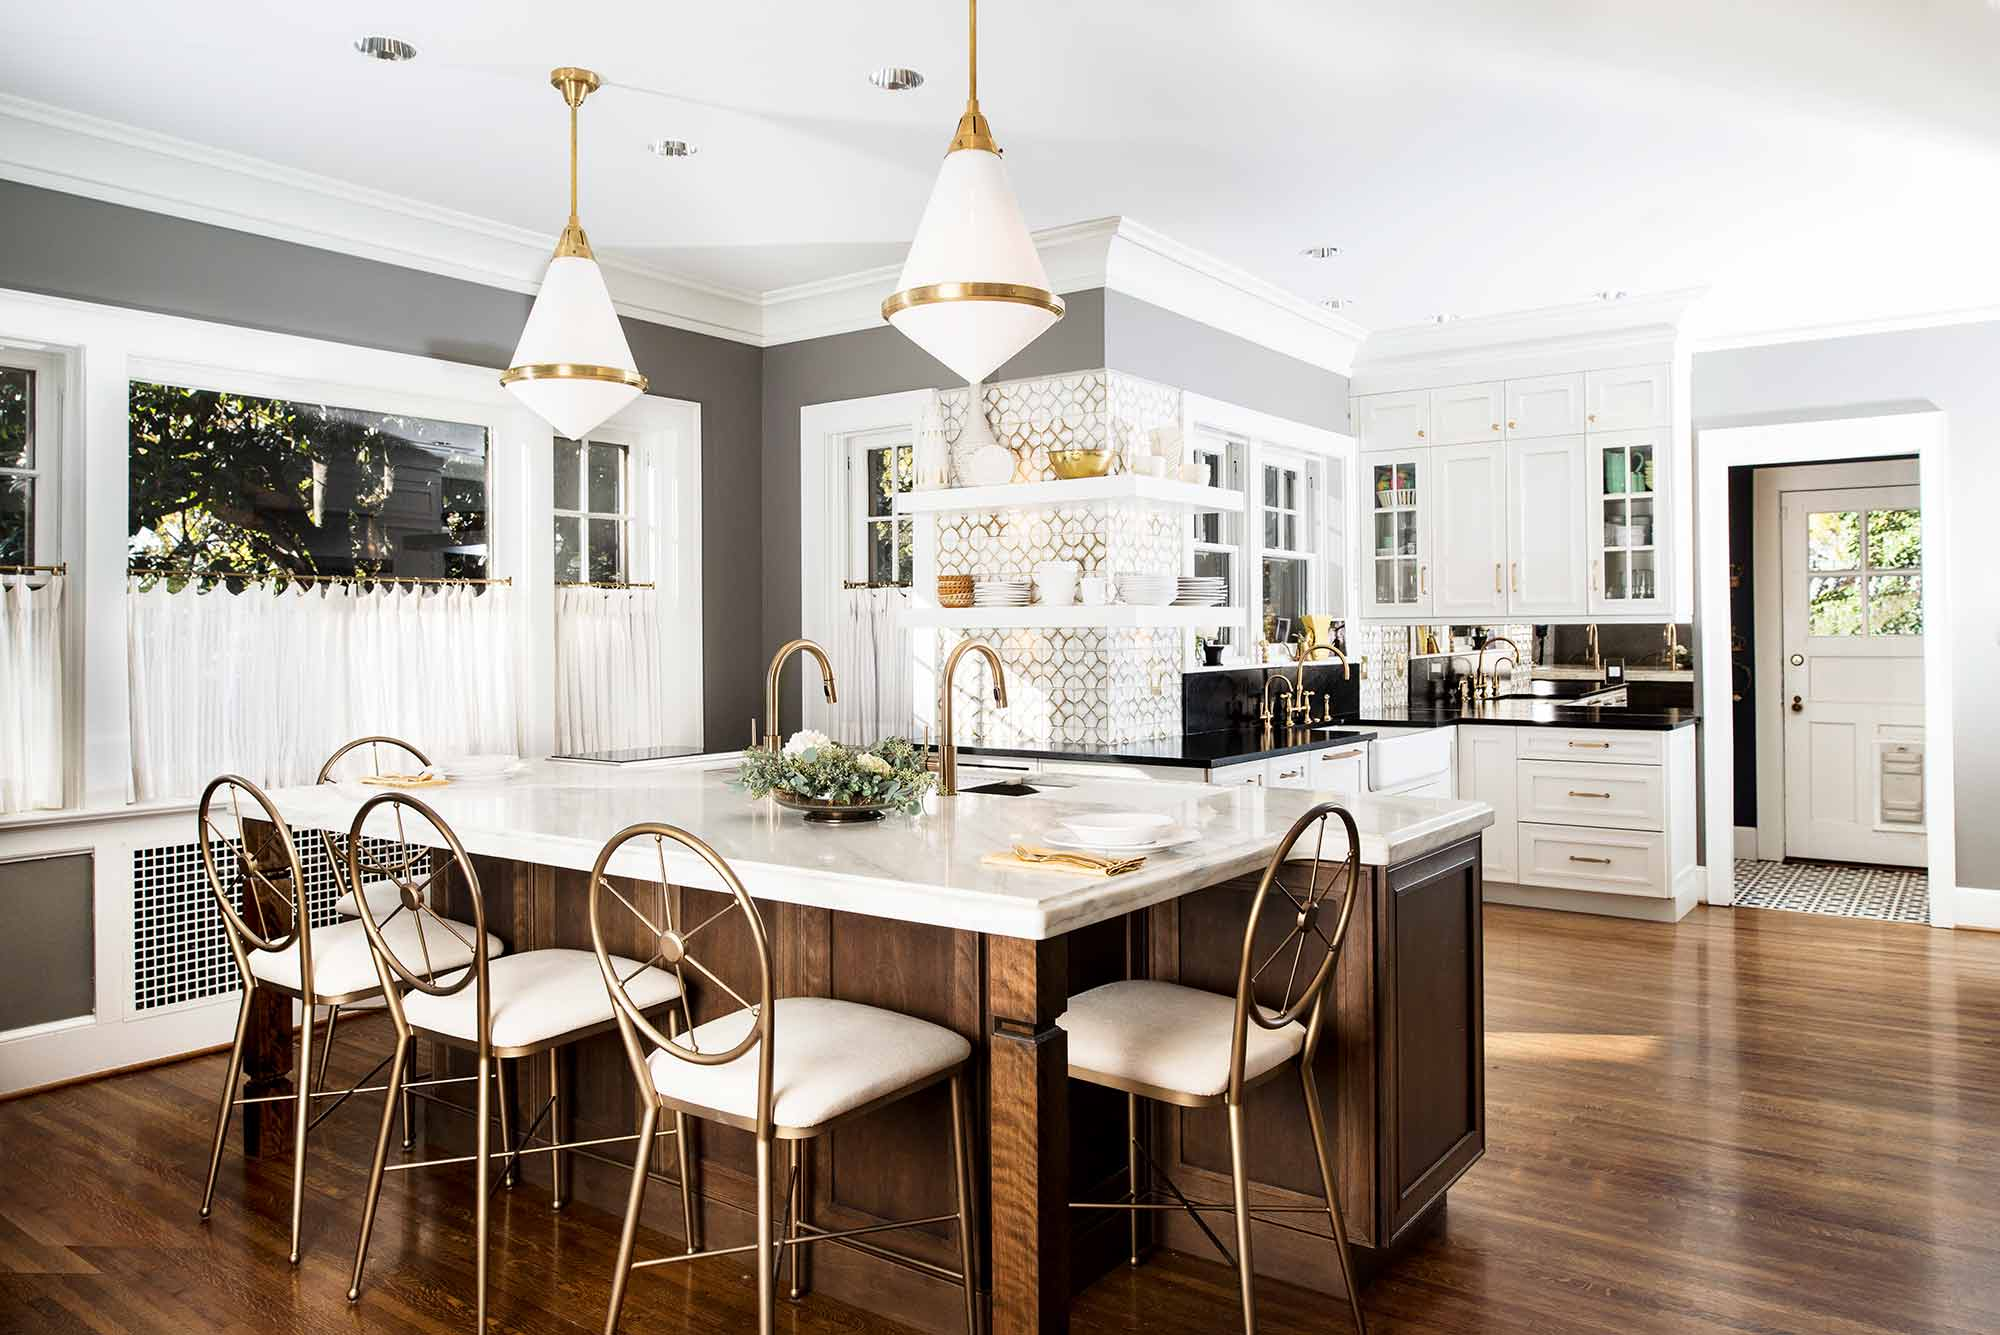 kitchen planners hutch furniture ideas tulsa designer cabinetry oklahoma historically classy 2 beautiful